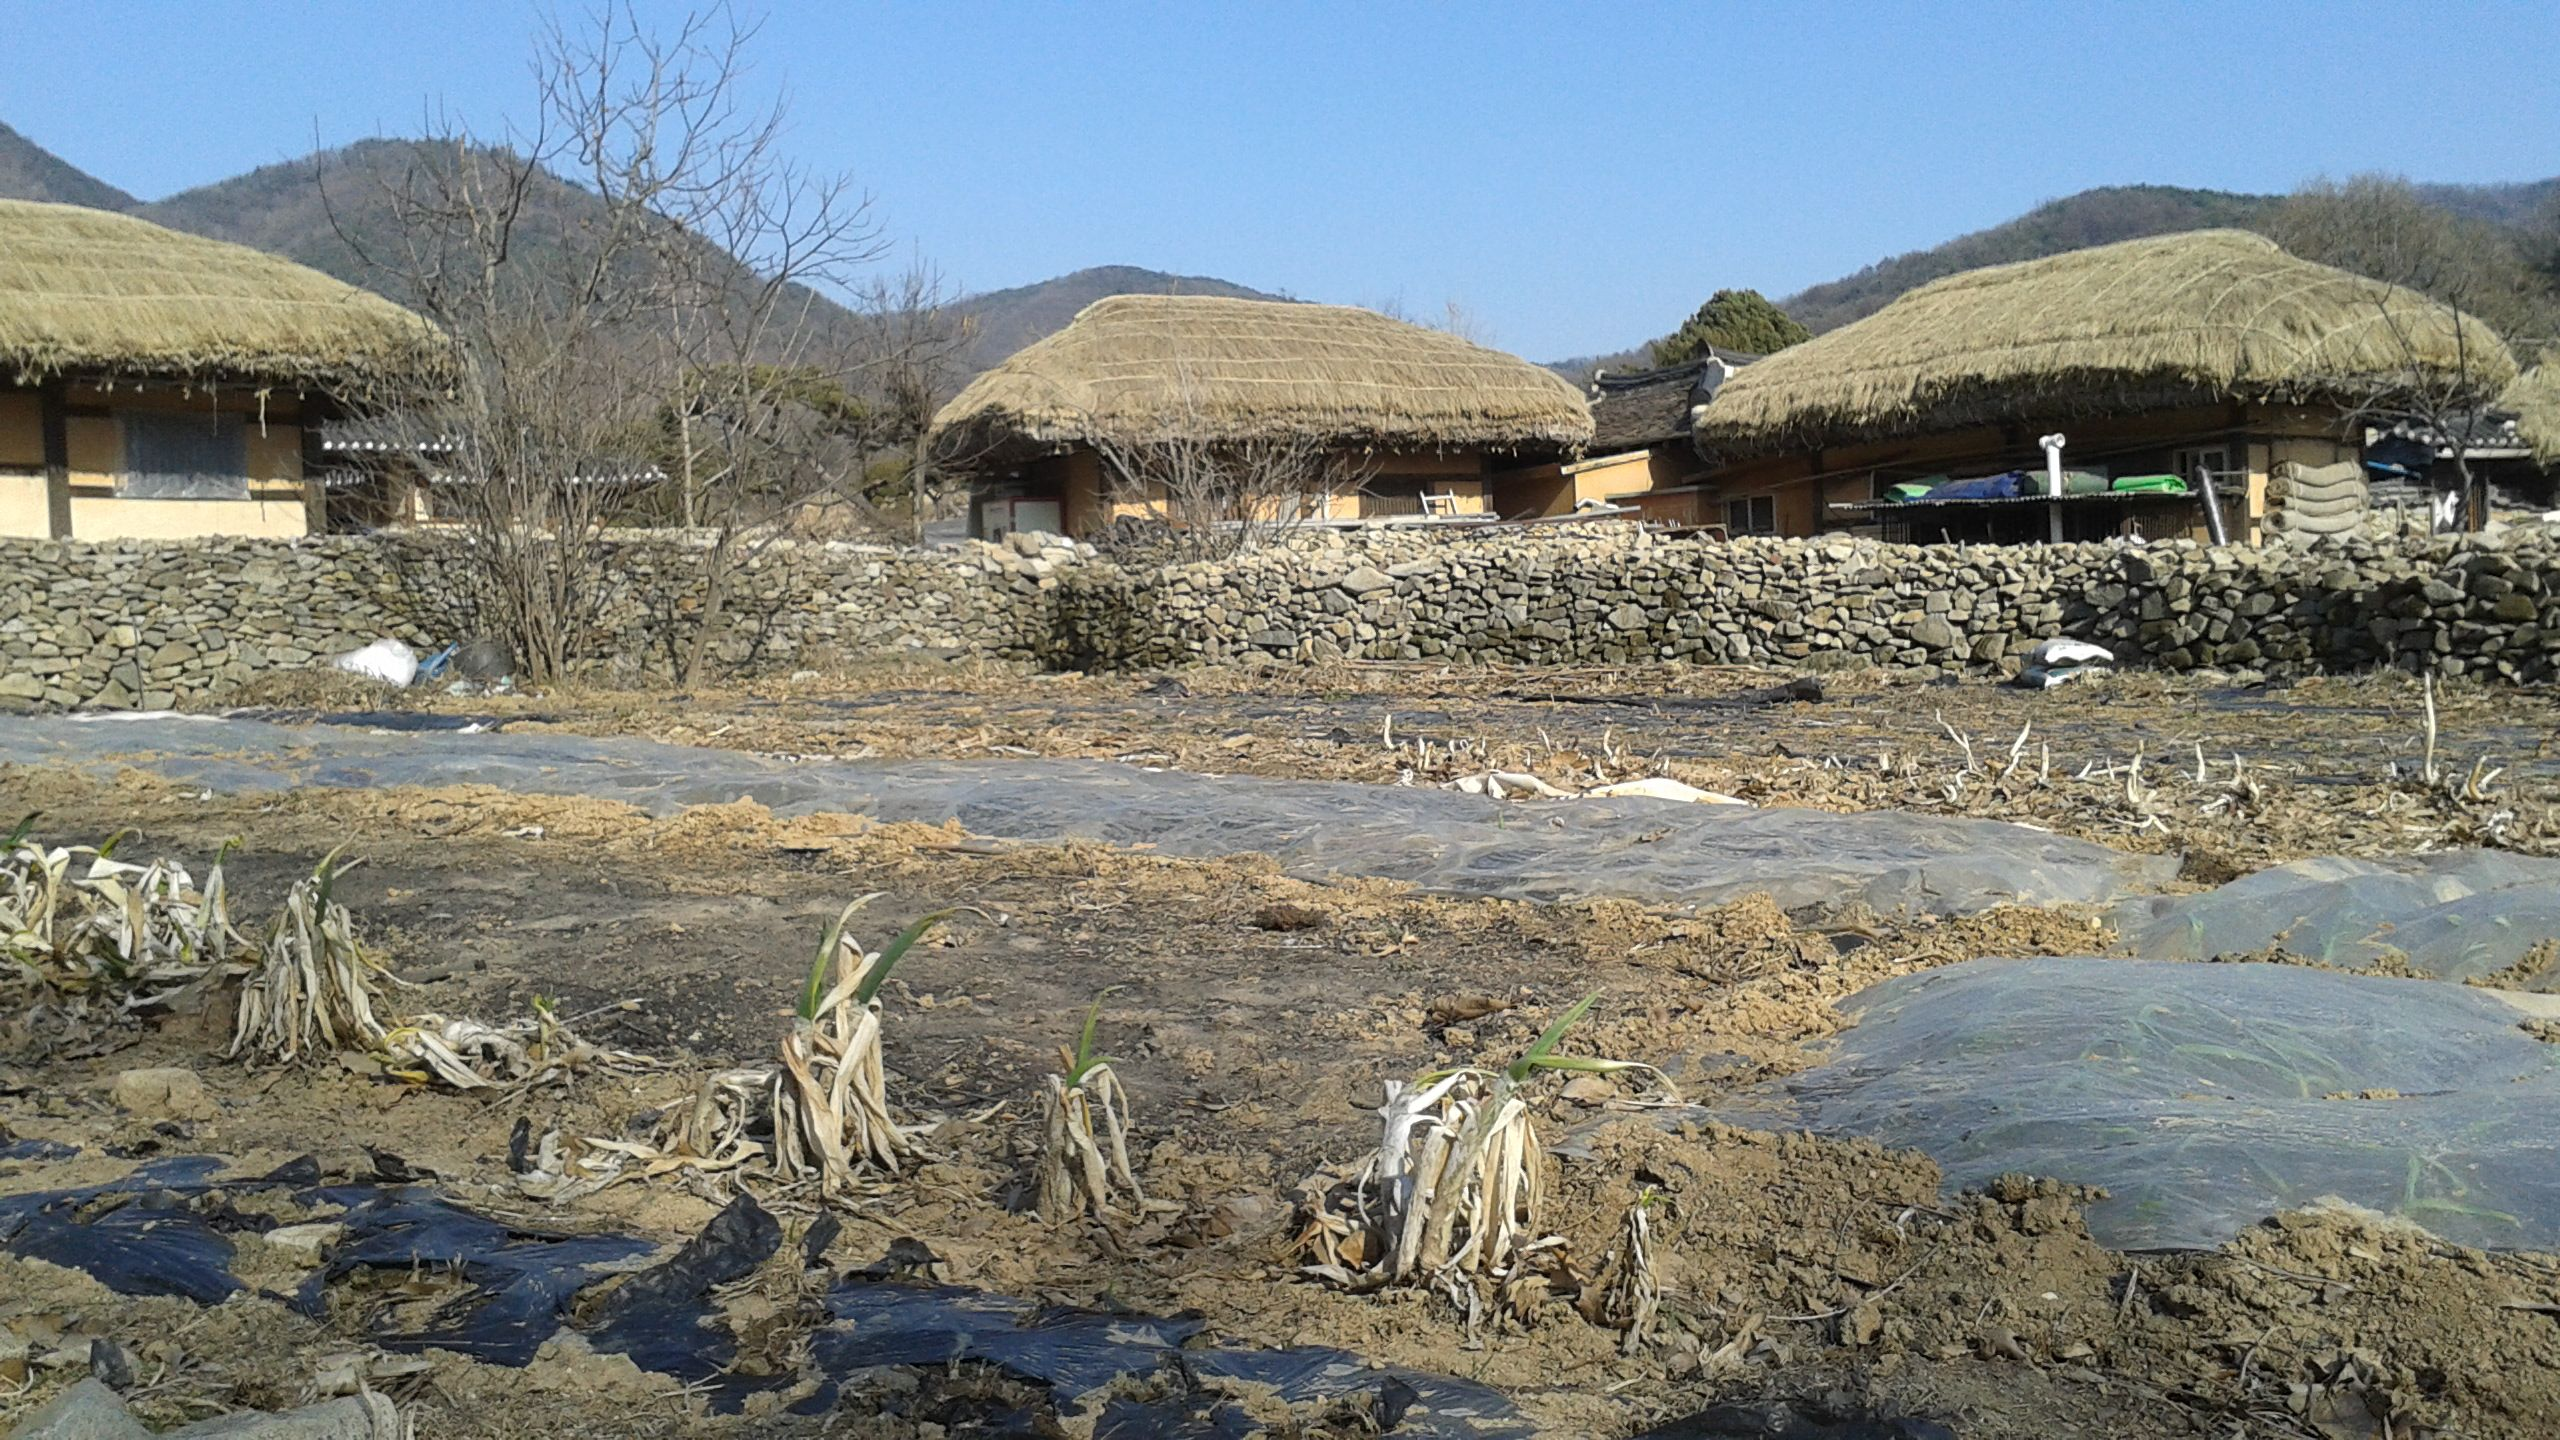 OEAM FOLK VILLAGE (아산 외암민속마을) http://natispiritedventure.weebly.com/blog/oeam-folk-village